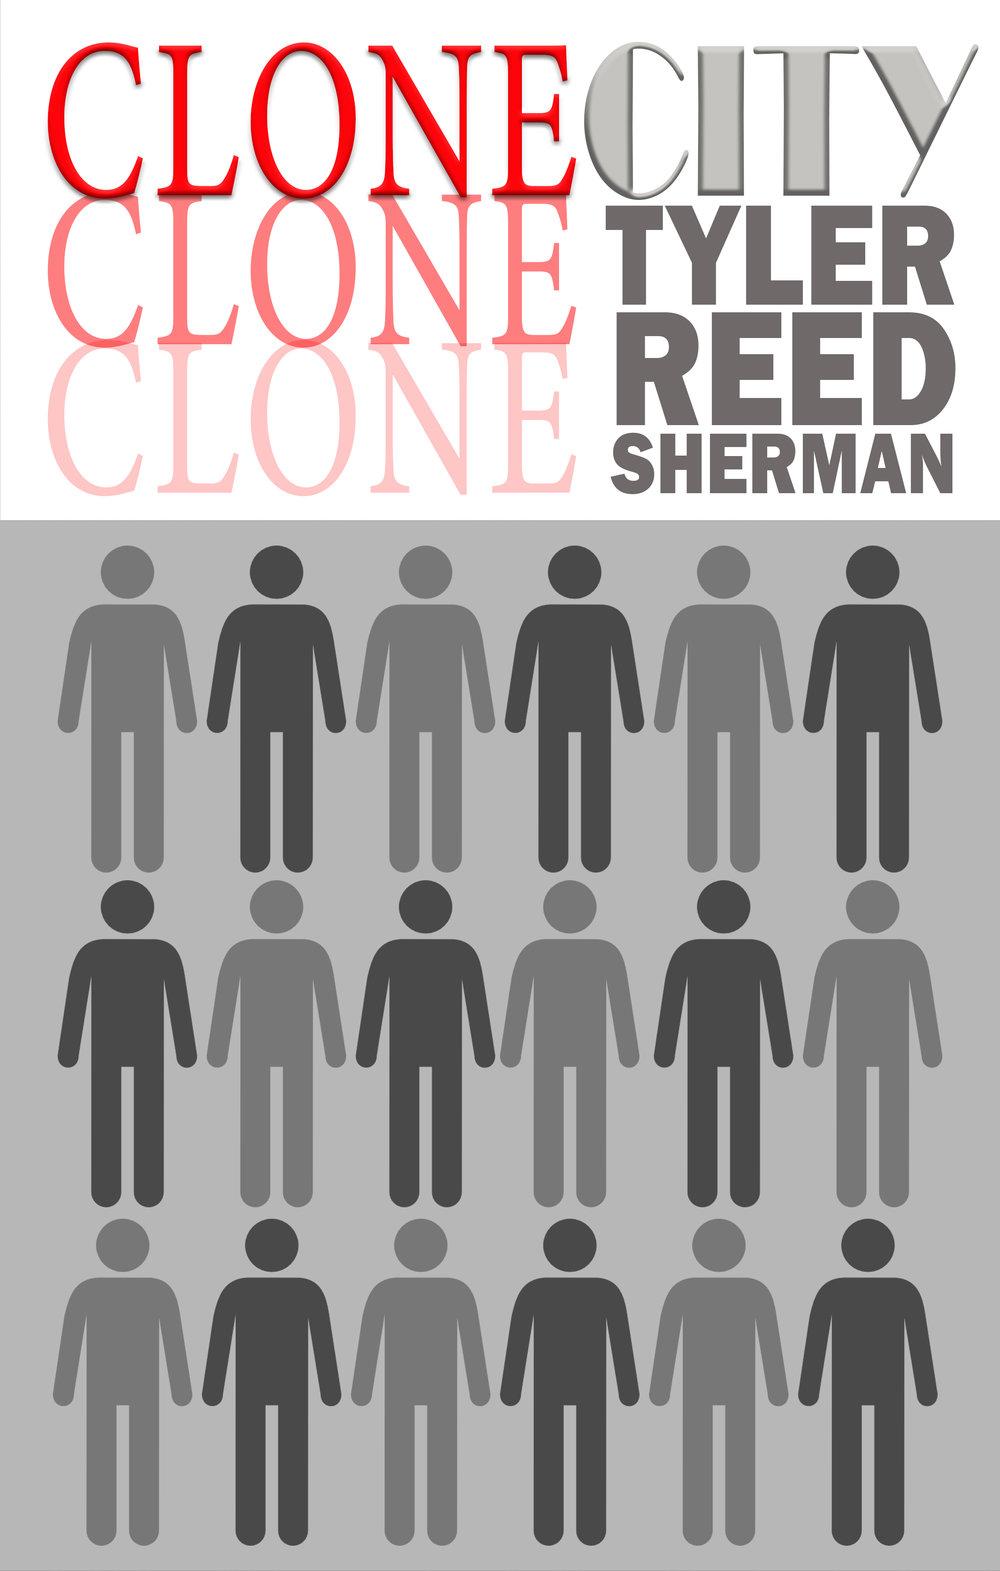 clonecitycover2.jpg